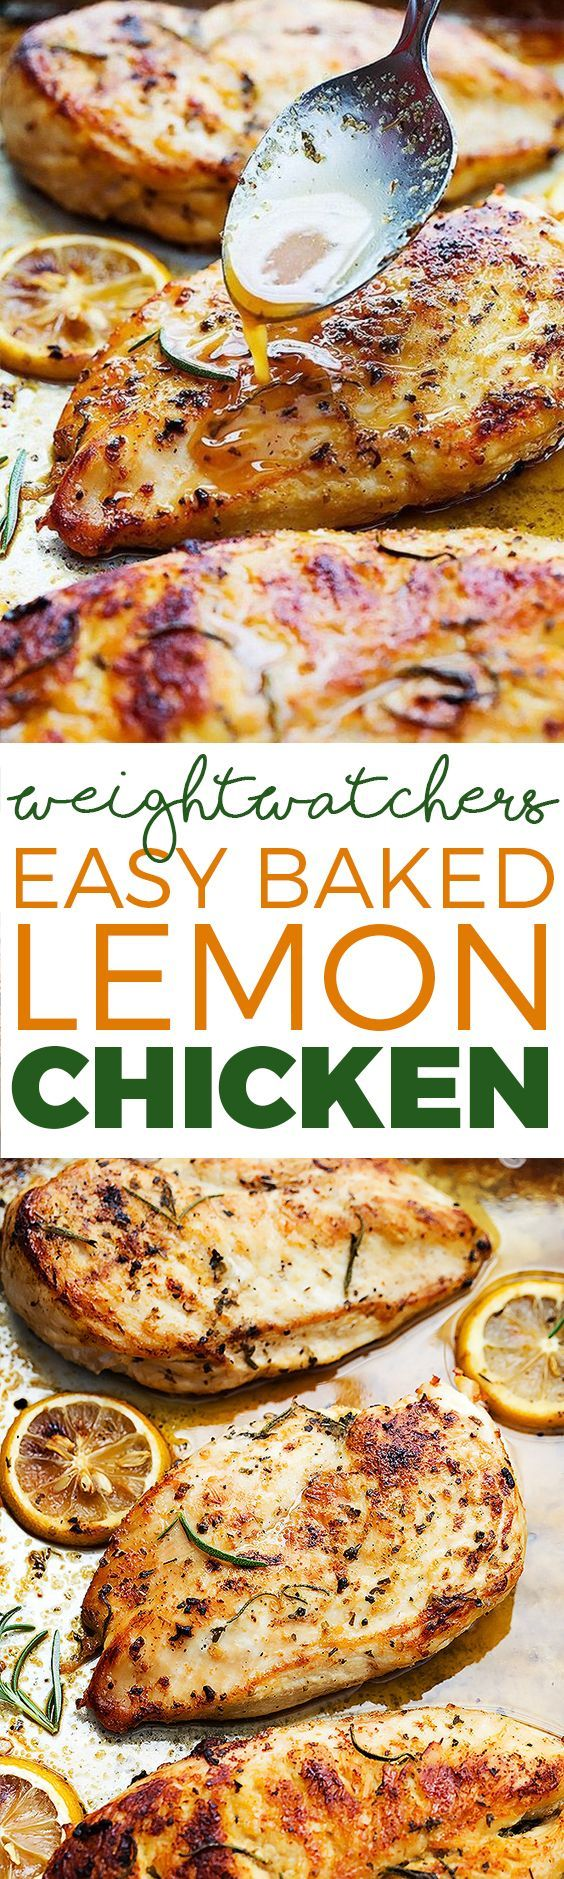 EASY HEALTHY BAKED LEMON CHICKEN (Weight Watchers SmartPoints)